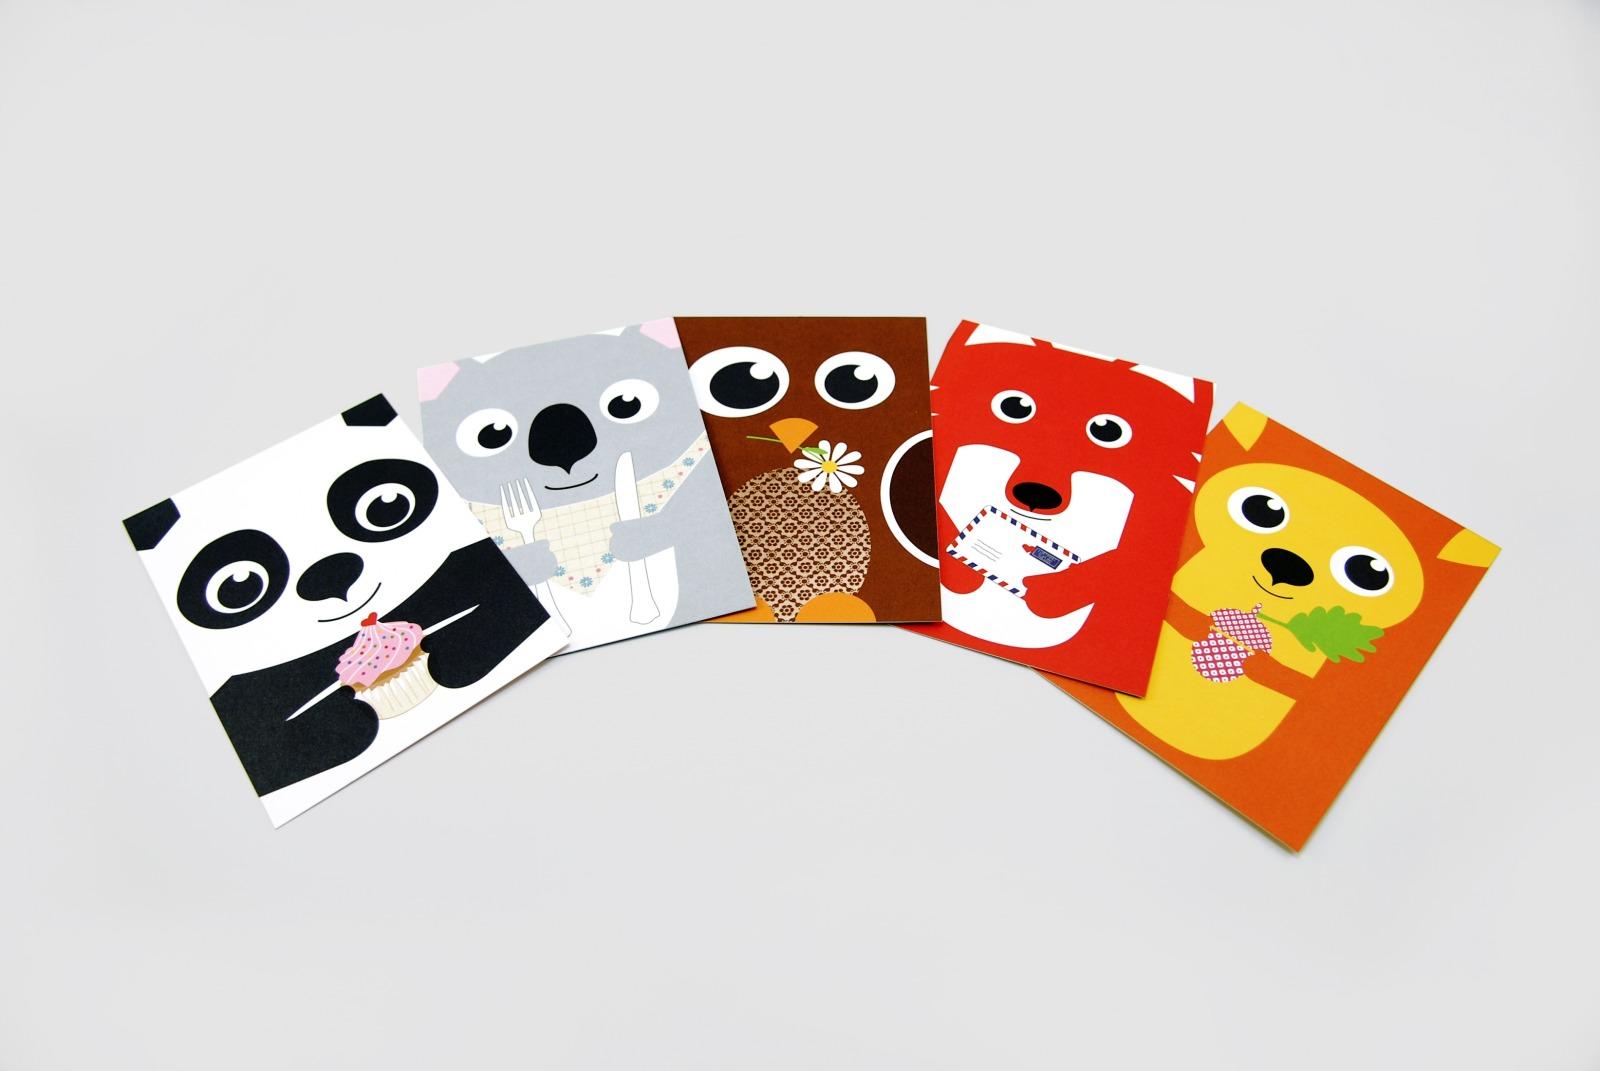 5 Postkarten Fuchs Panda Koala Spatz und Eichhoernchen